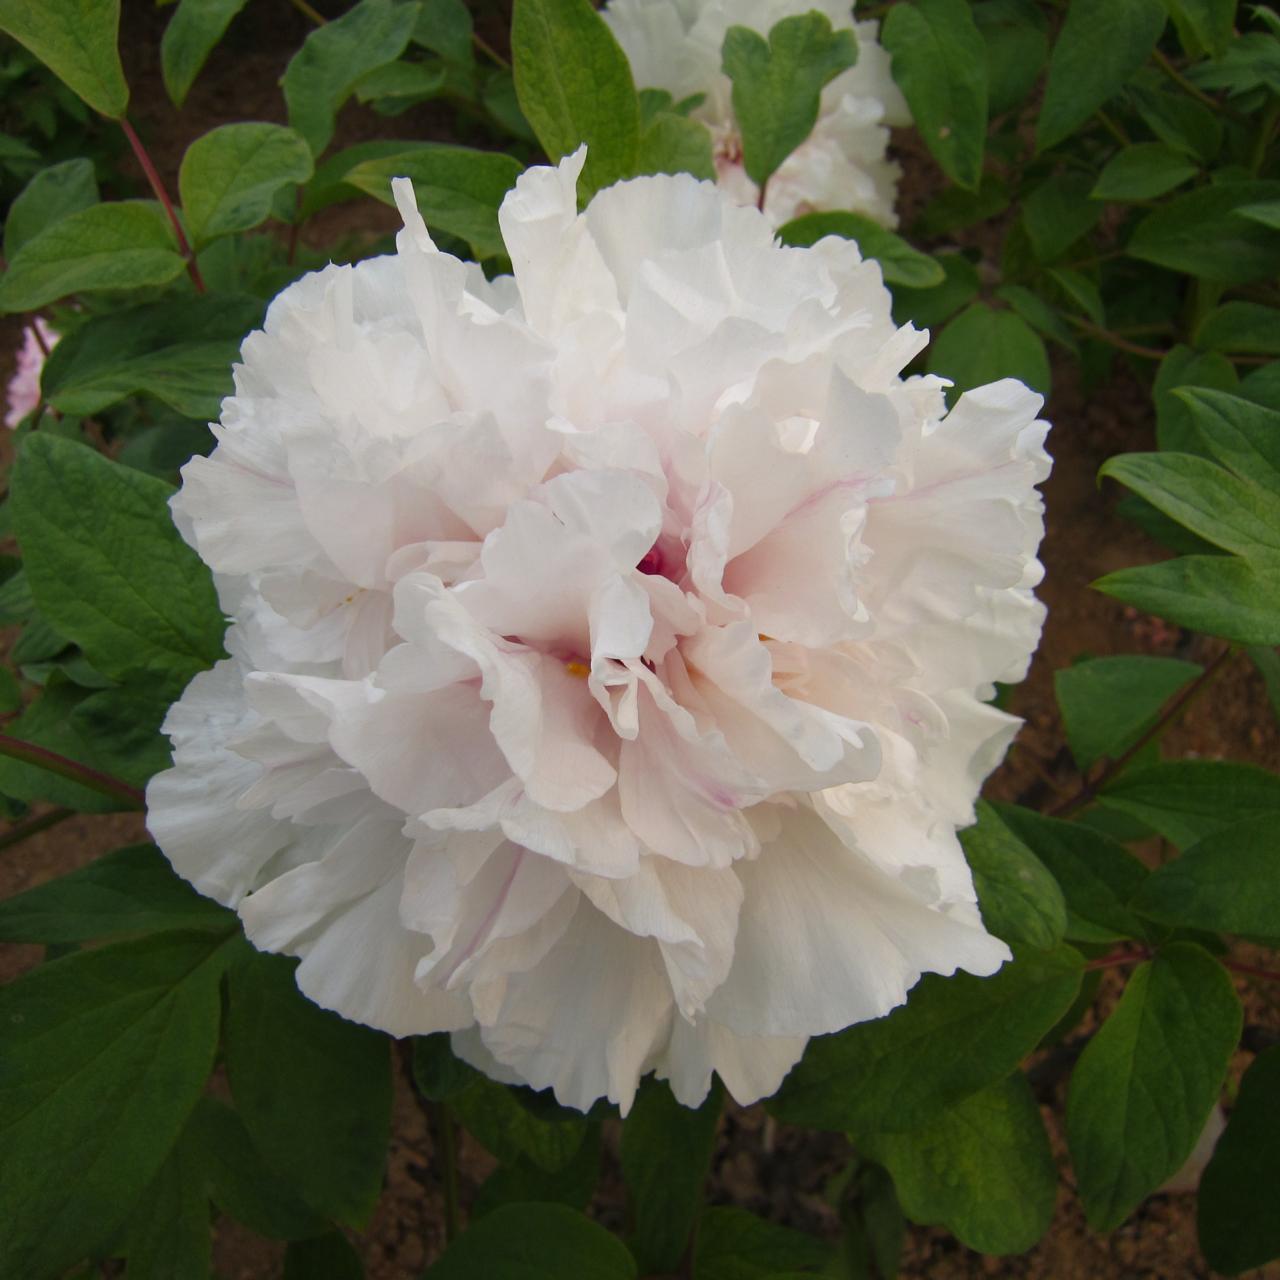 Paeonia suffruticosa 'Juan Ye Hong' plant